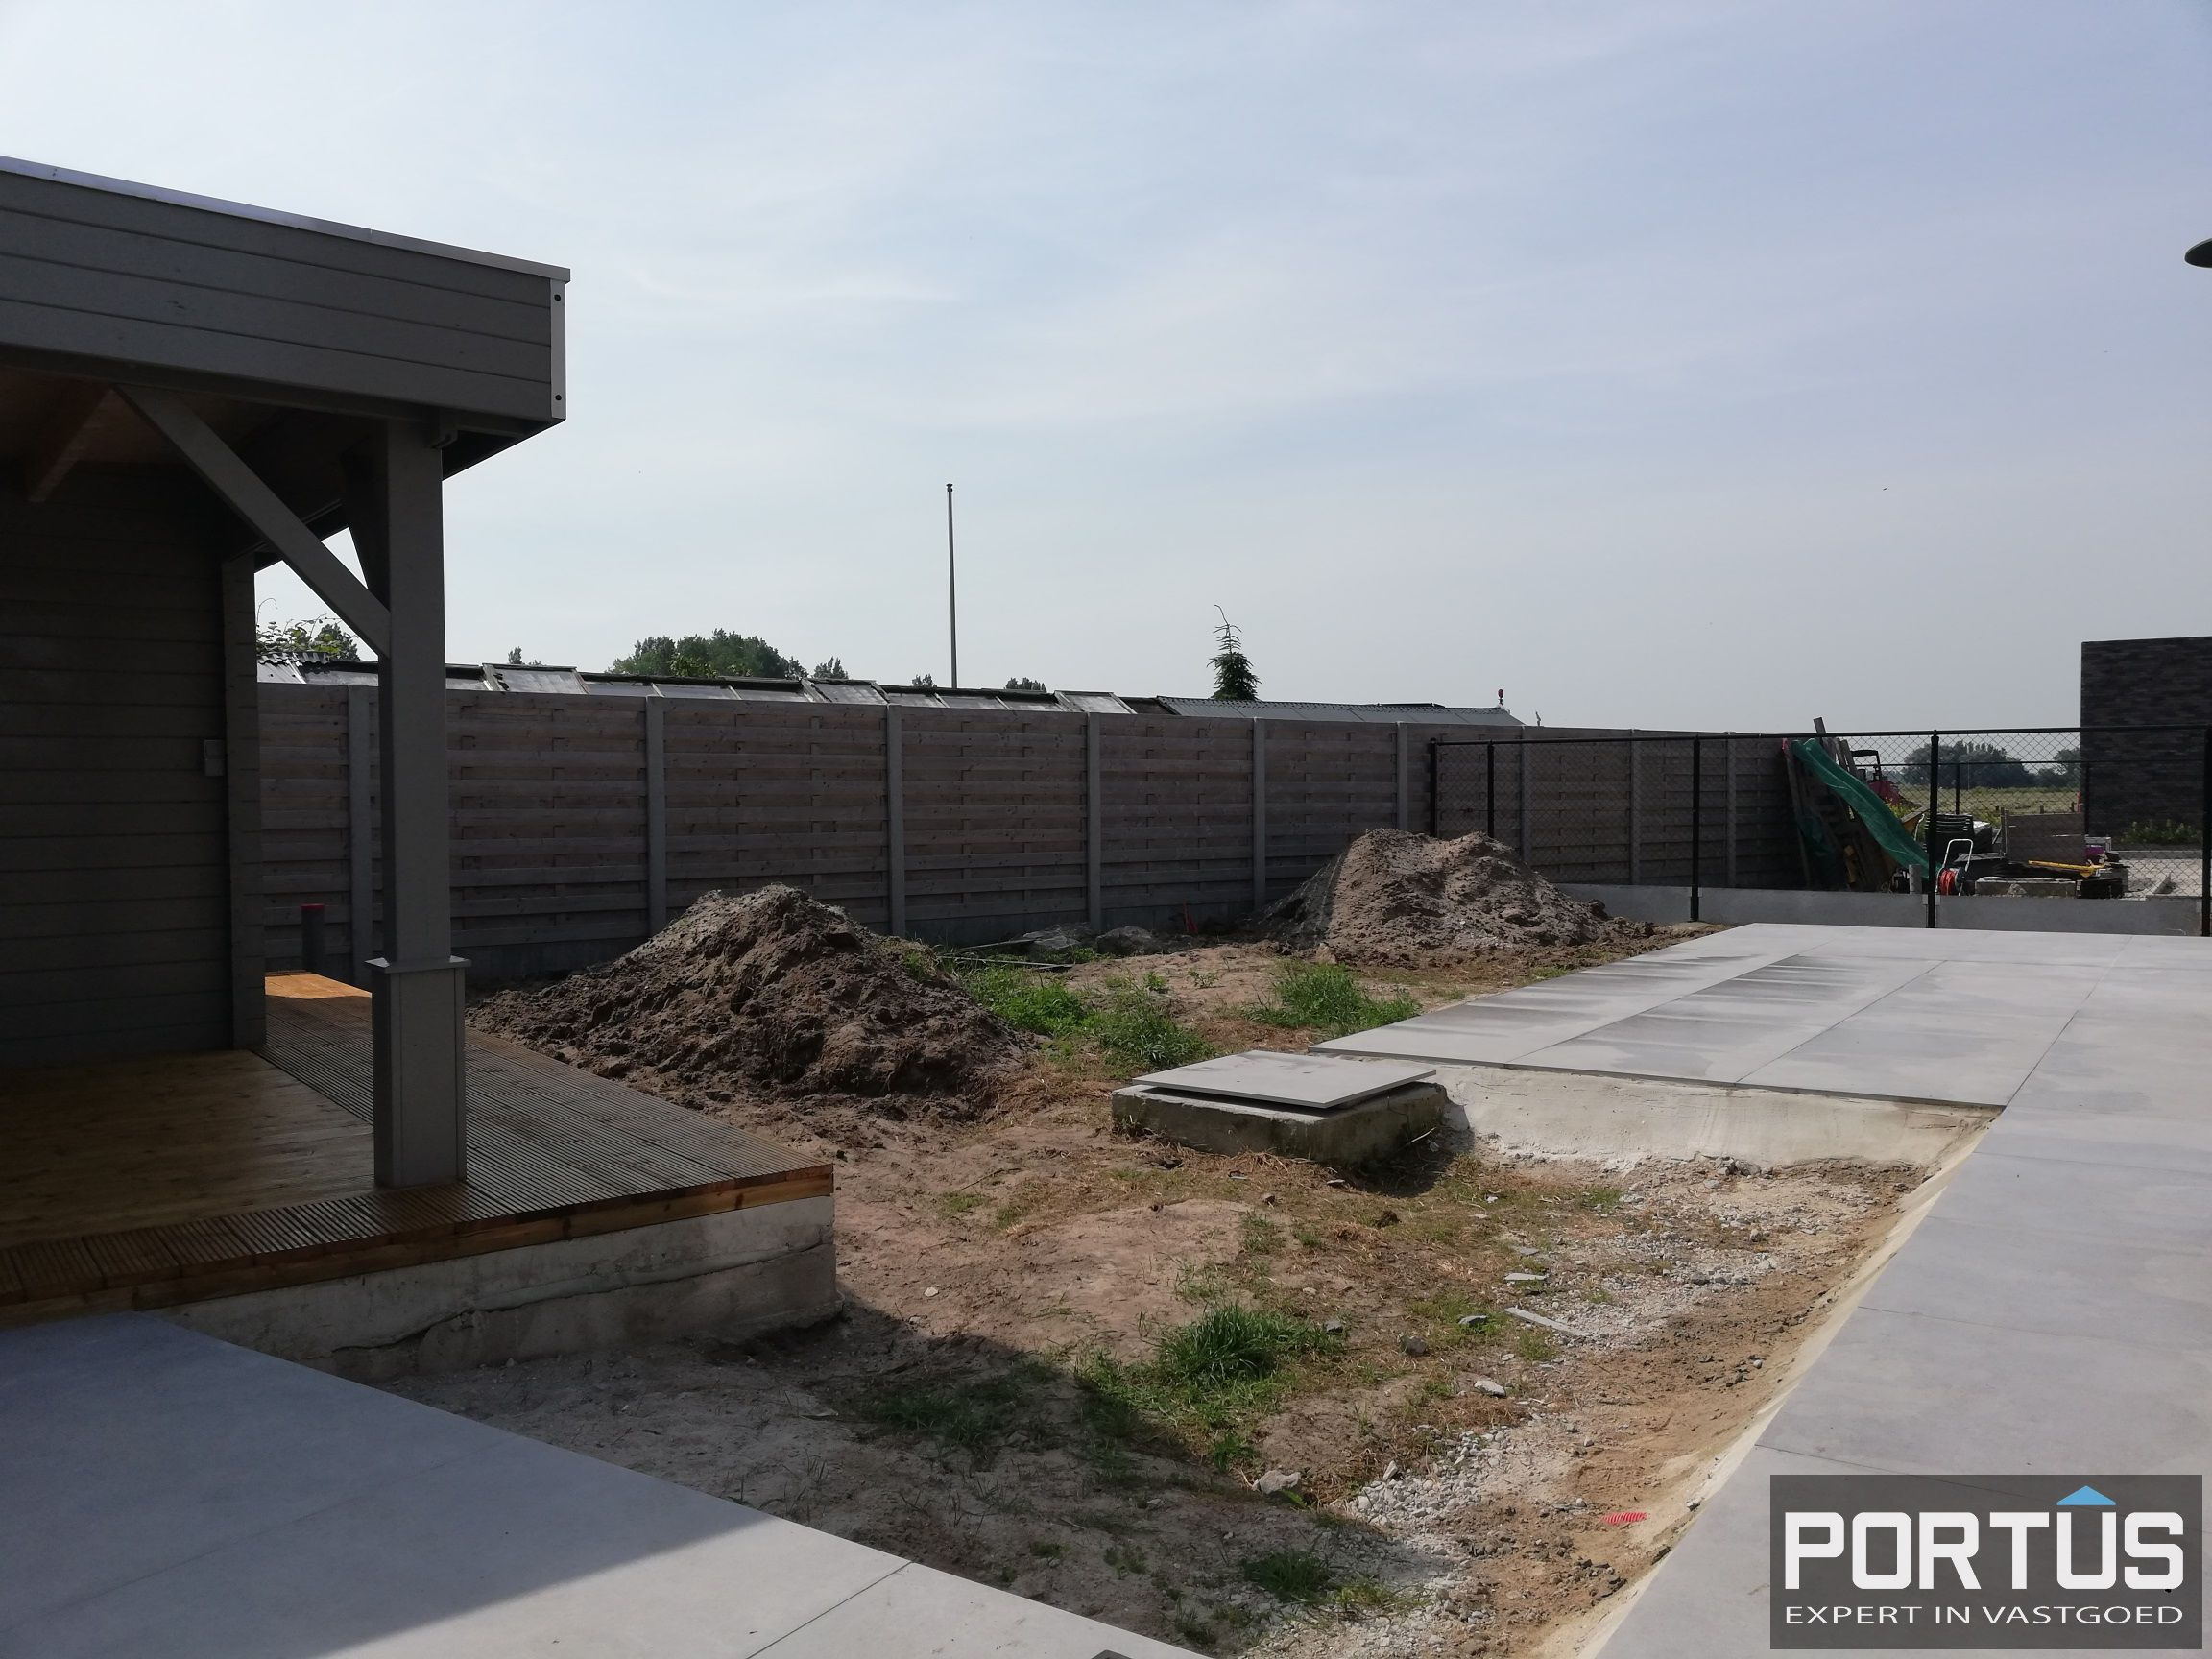 Nieuwbouwvilla te huur te Westende - 9790